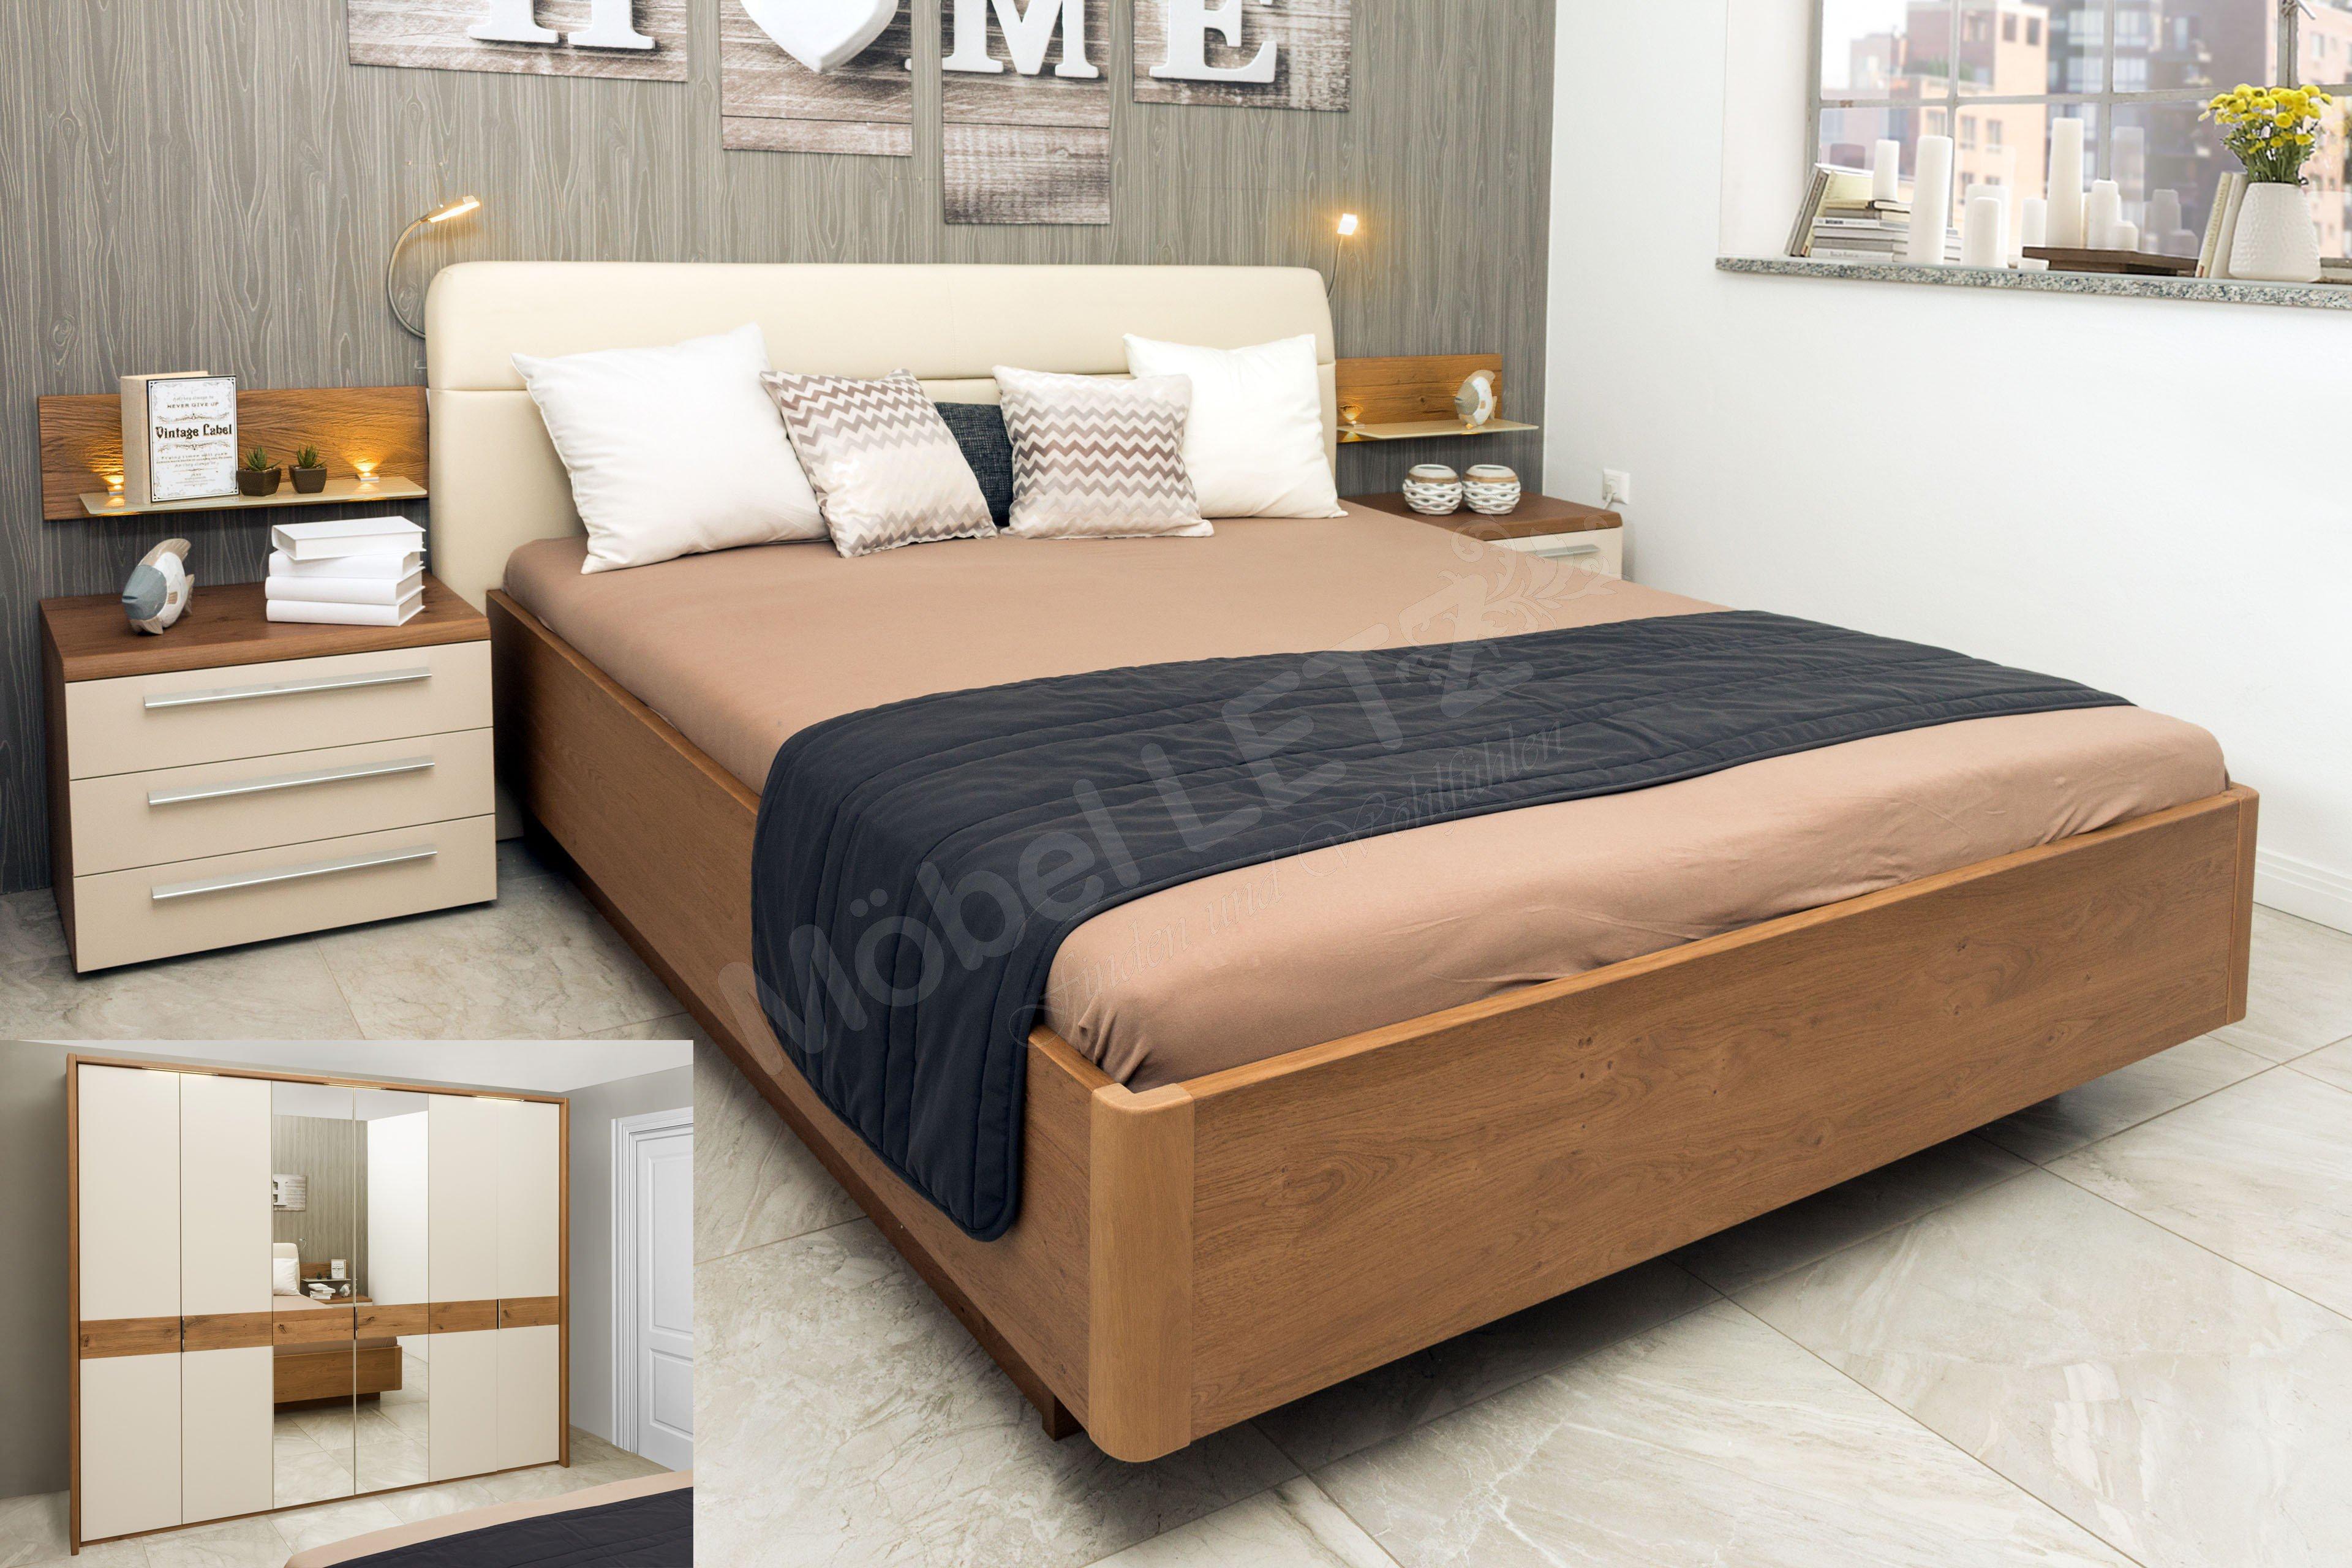 schlafzimmer h ngeschrank h ngeschrank wei hochglanz. Black Bedroom Furniture Sets. Home Design Ideas